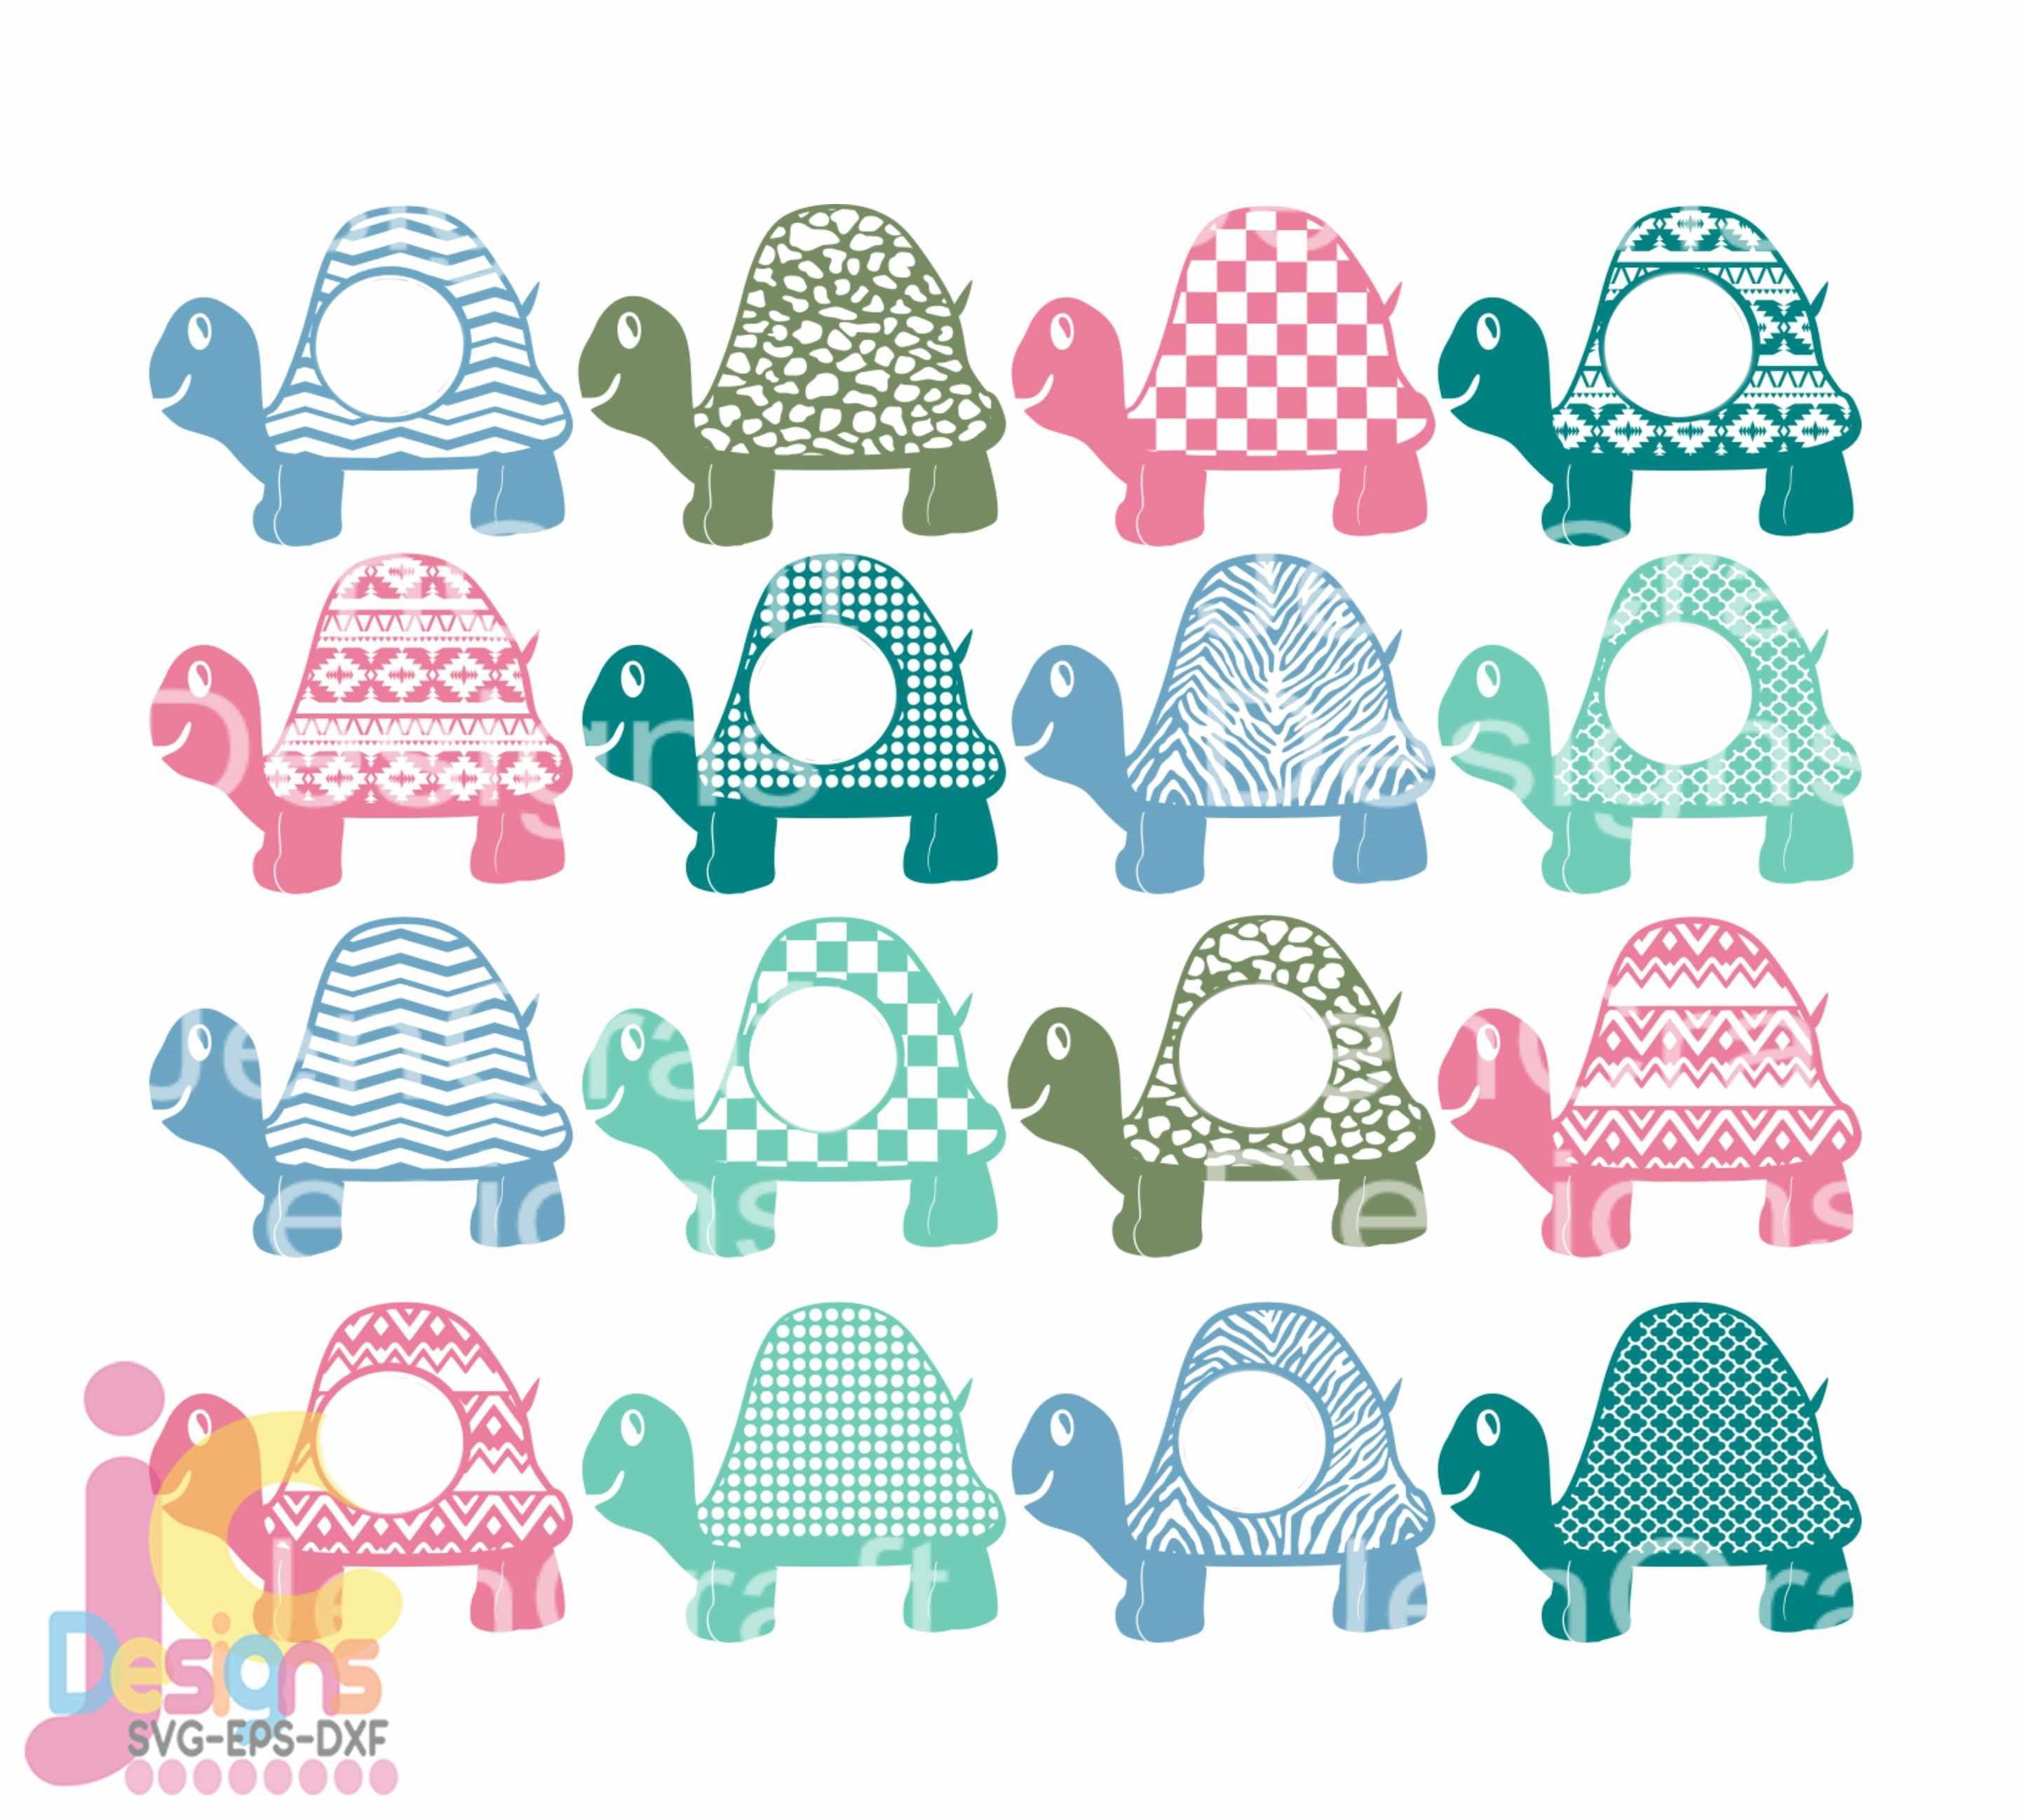 Turtle Svg Monogram Frame Cute Kids Summer Beach Svg Cut Files Svg Dxf Ai Eps Png Monogram Svg Cricut Silhouette Digital Cut Files